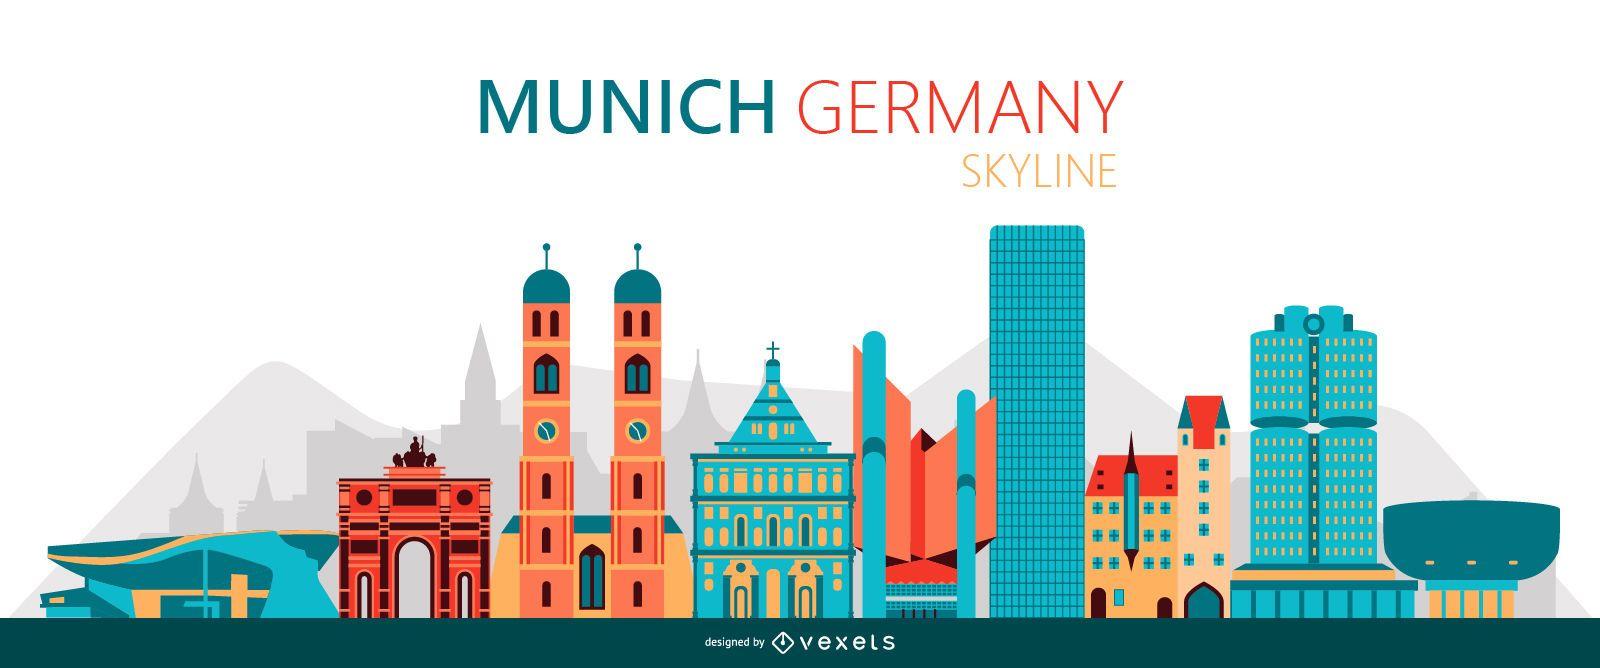 Munich skyline illustration